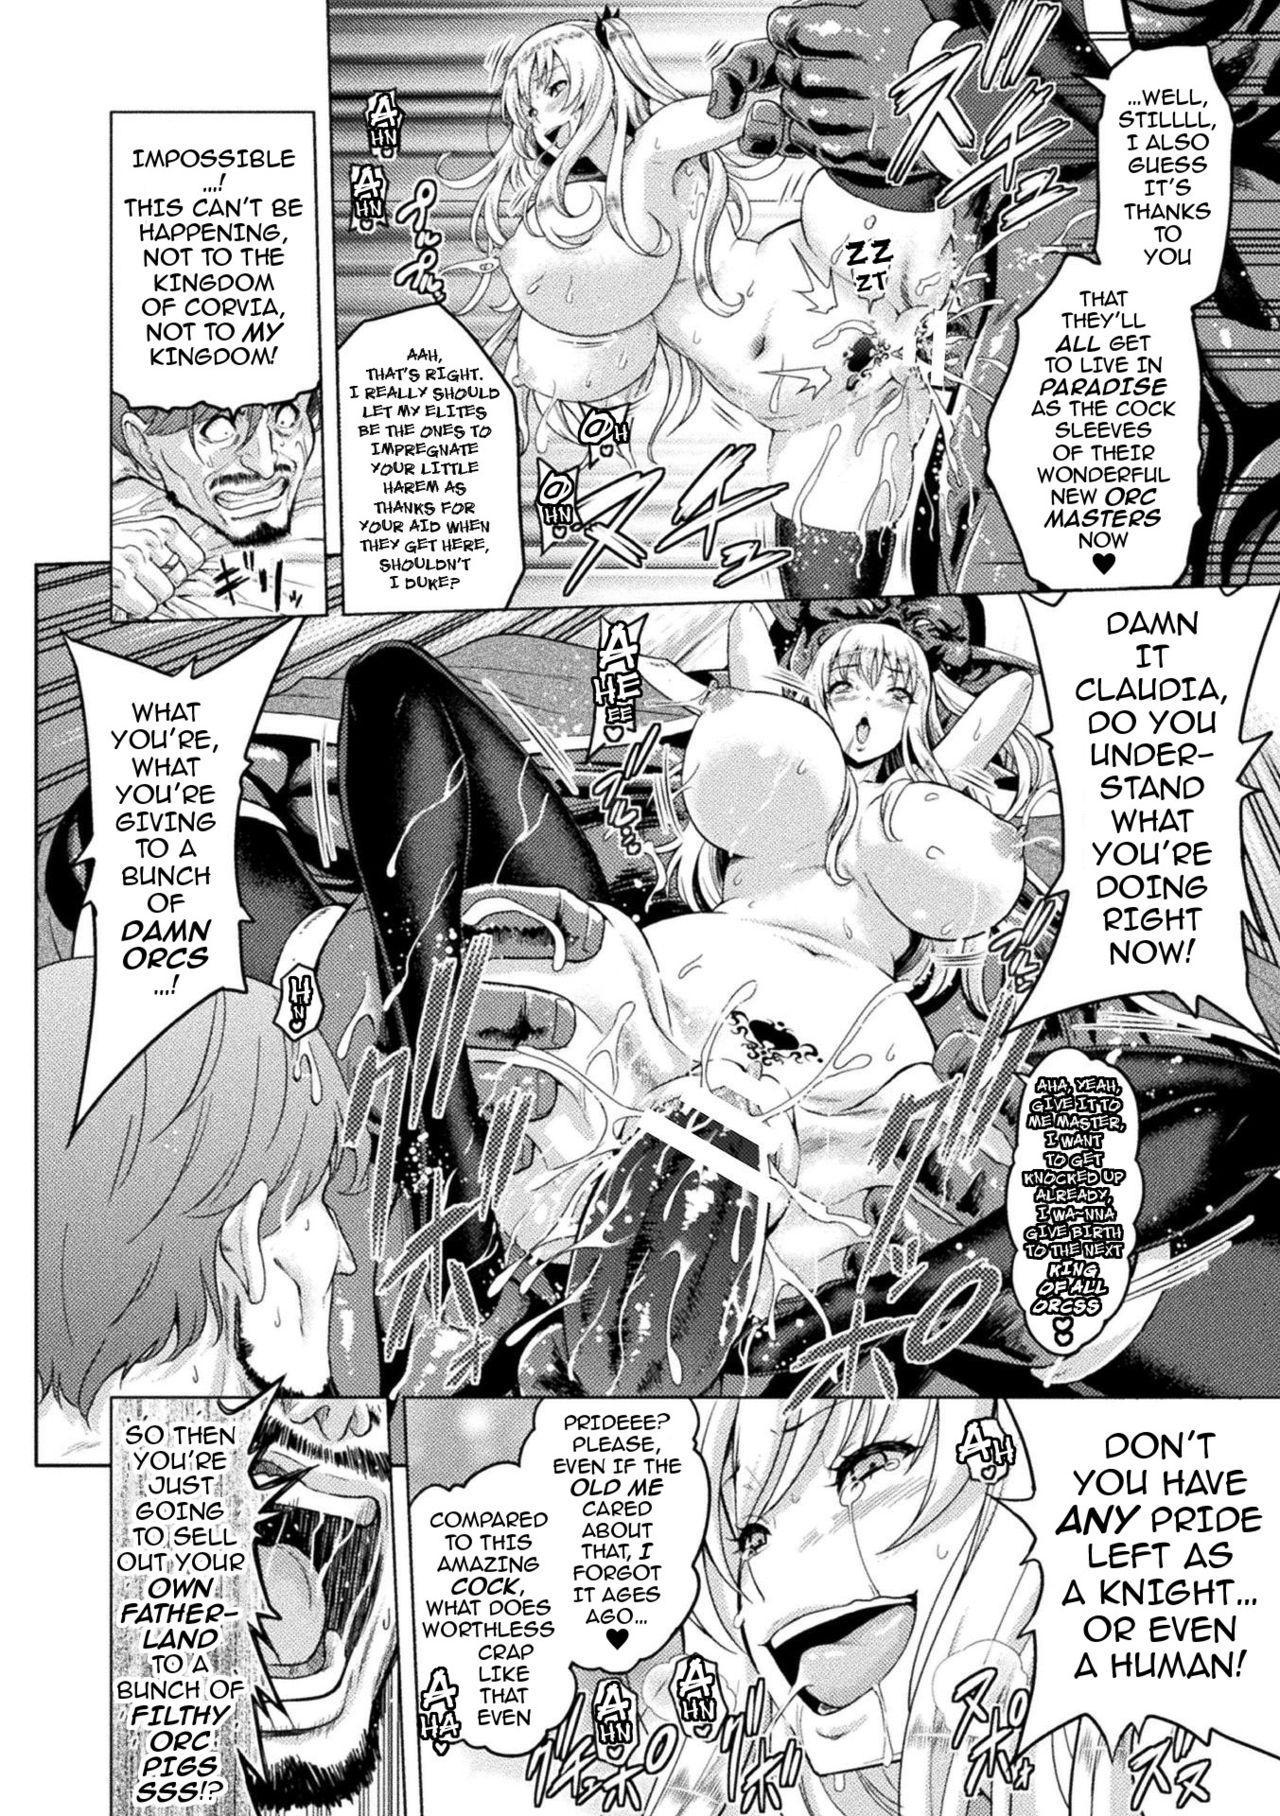 [Yamada Gogogo] Erona ~Orc no Inmon ni Okasareta Onna Kishi no Matsuro~   Erona ~The Fall of a Beautiful Knight Cursed with the Lewd Mark of an Orc~ Ch. 1-6 [English] {darknight} 98